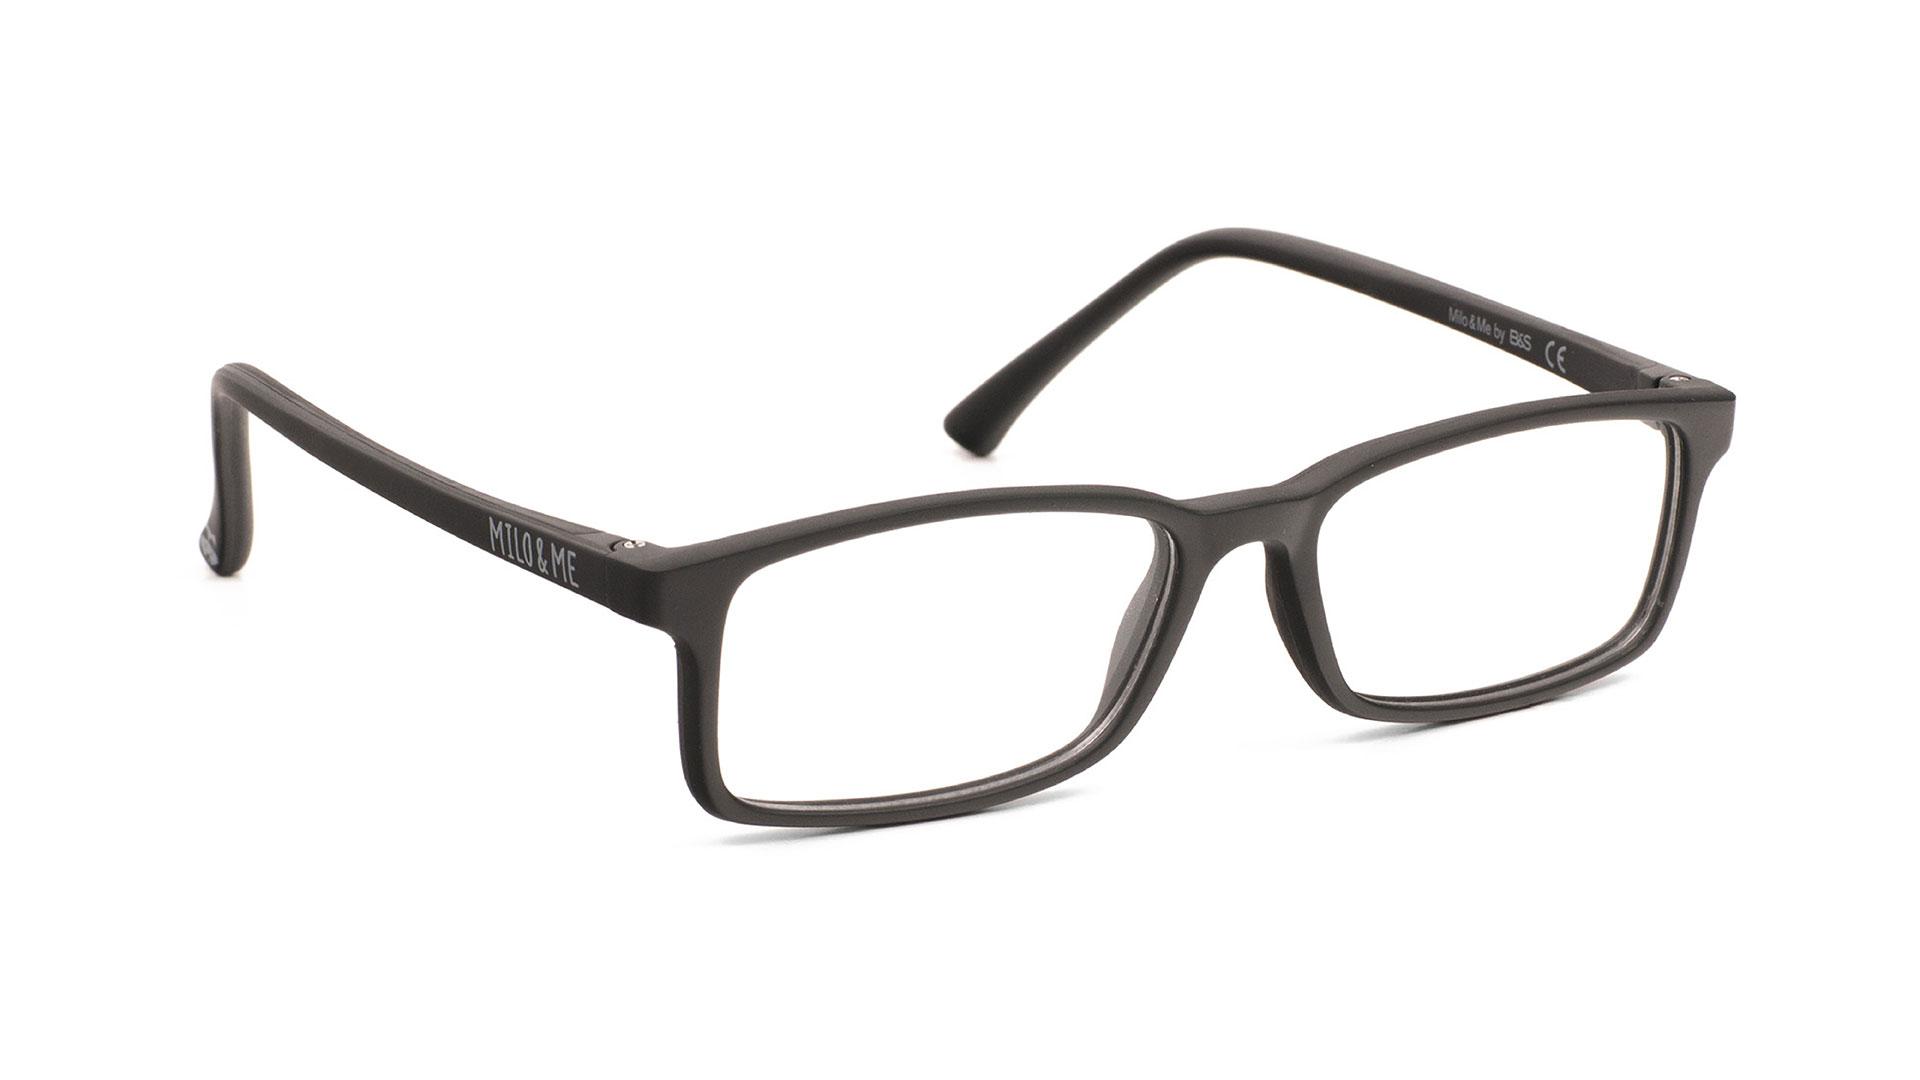 BlackBlack H85021-00 - Milo & Me Eyewear - Optimum RX Lens Specialists